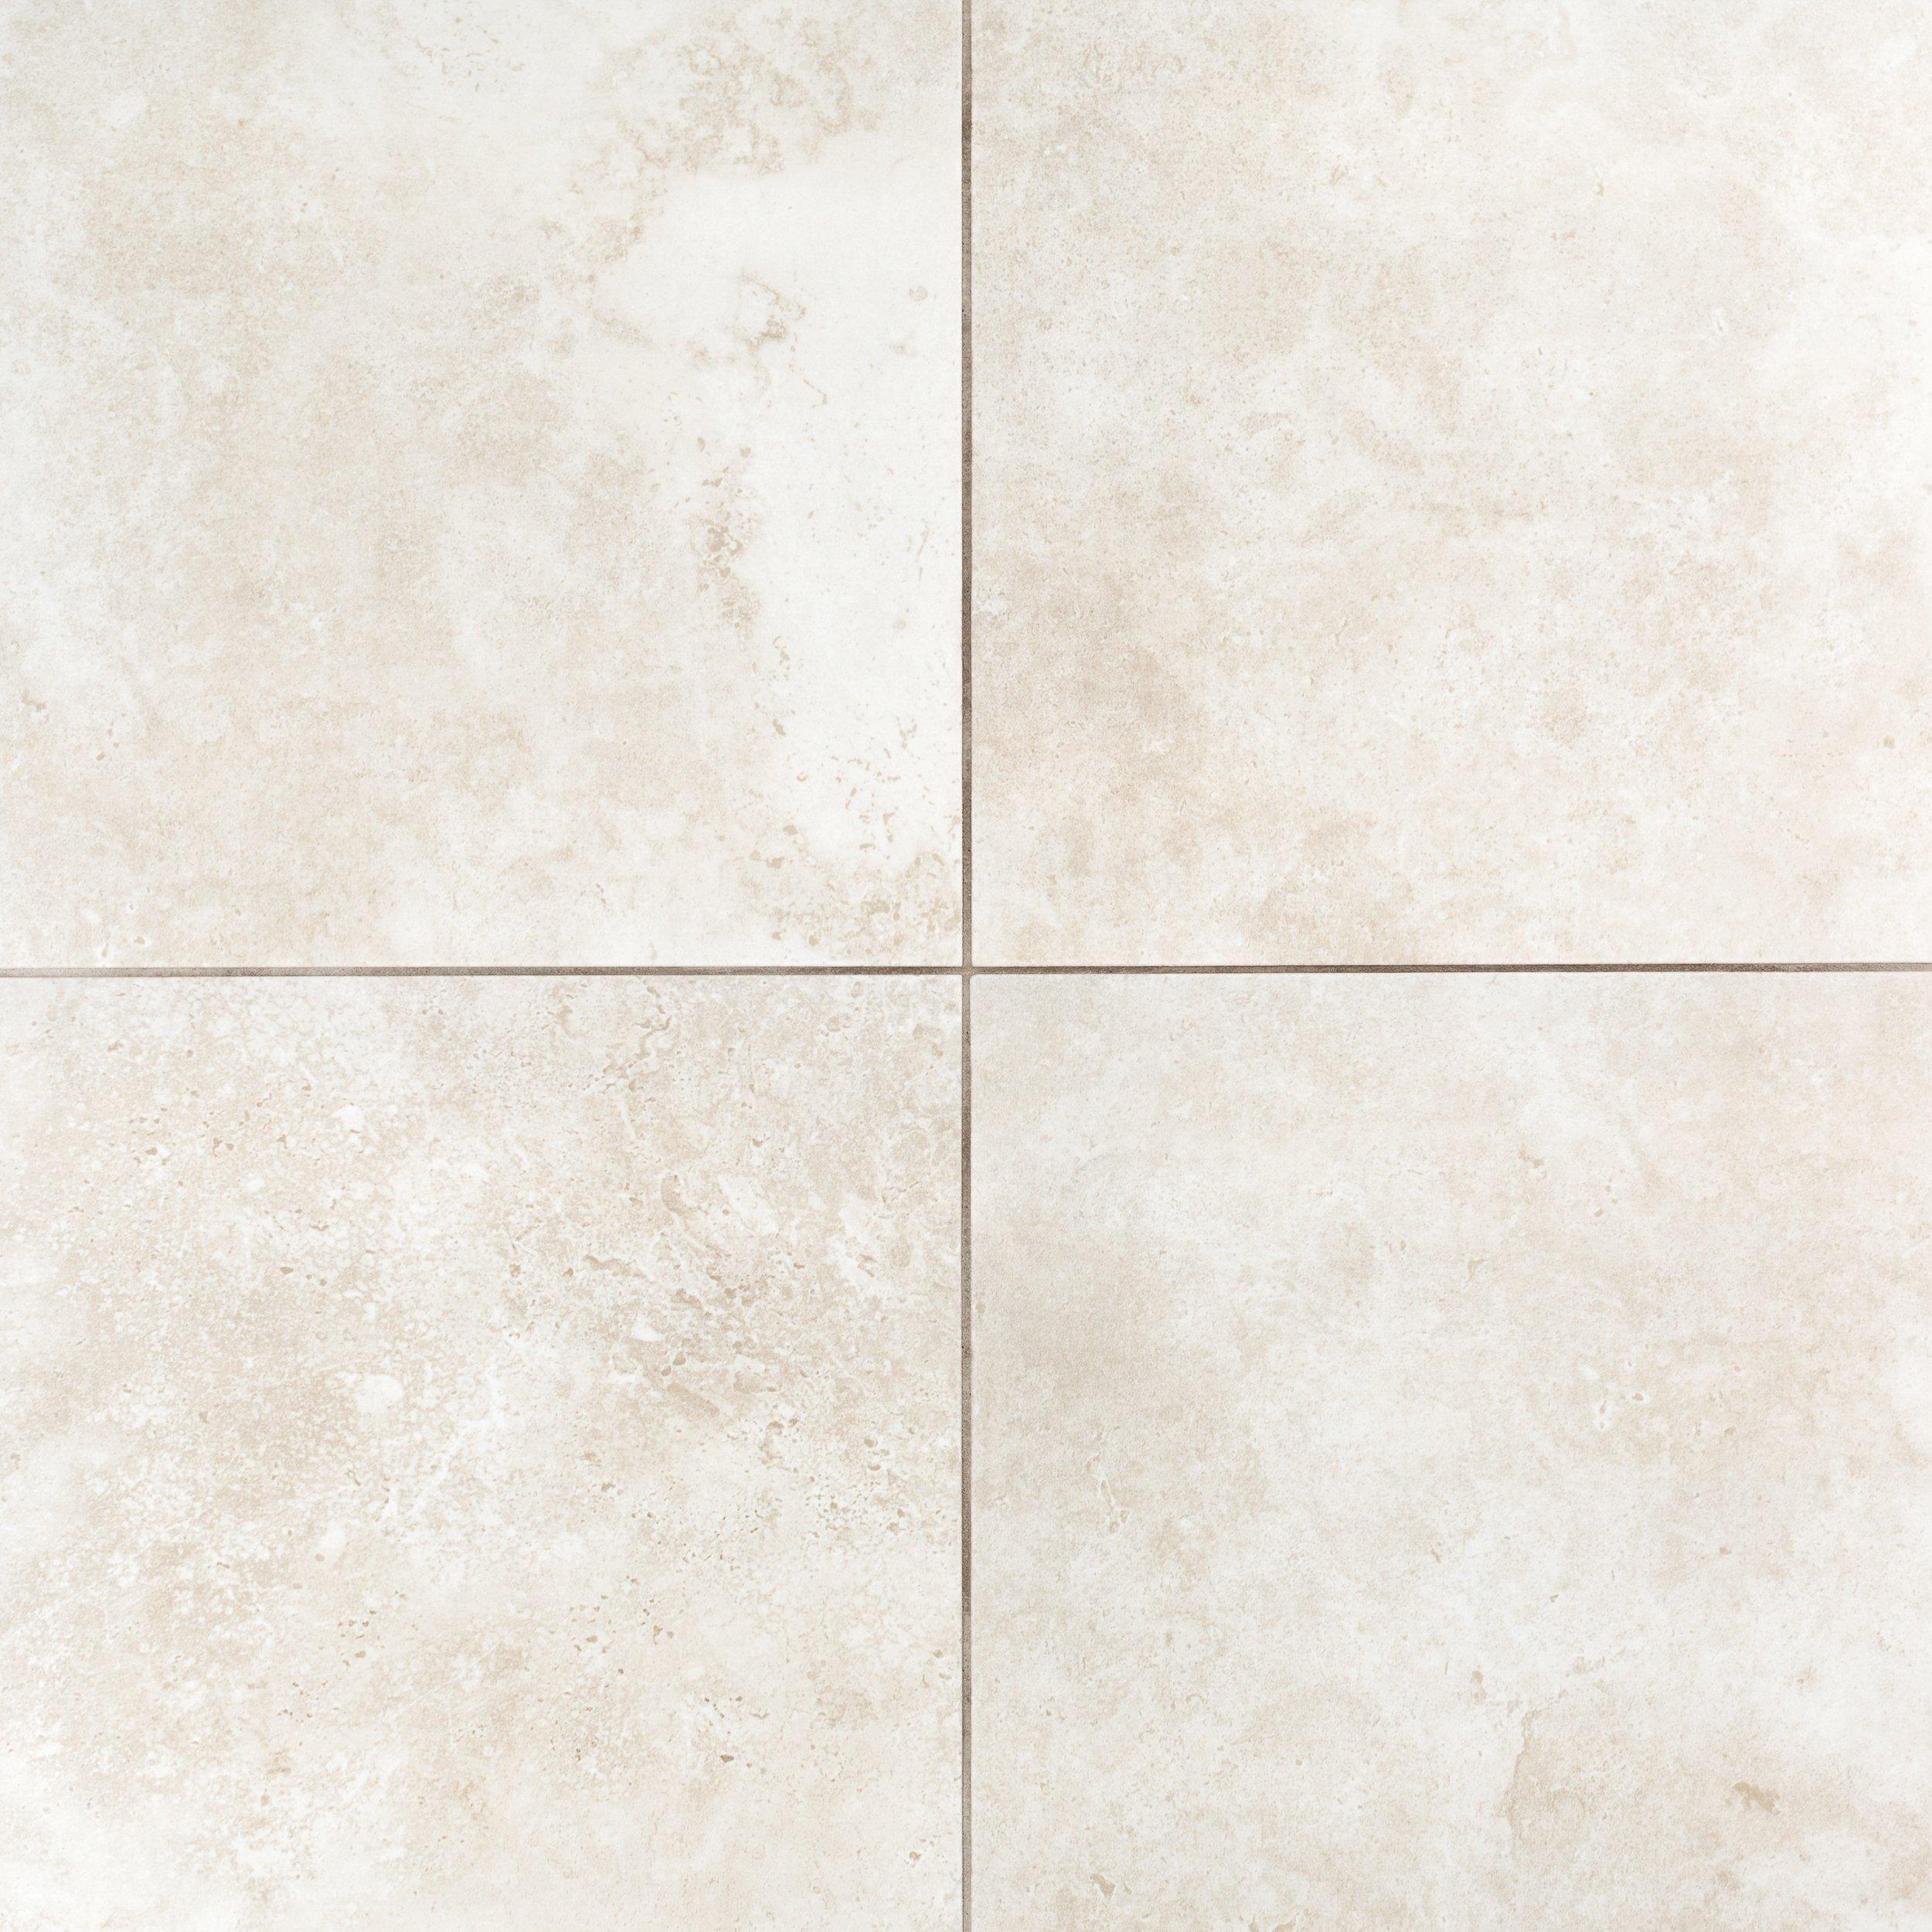 Stockton Sand Porcelain Tile Floor Decor Porcelain Tile Stone Look Tile Porcelain Floor Tiles